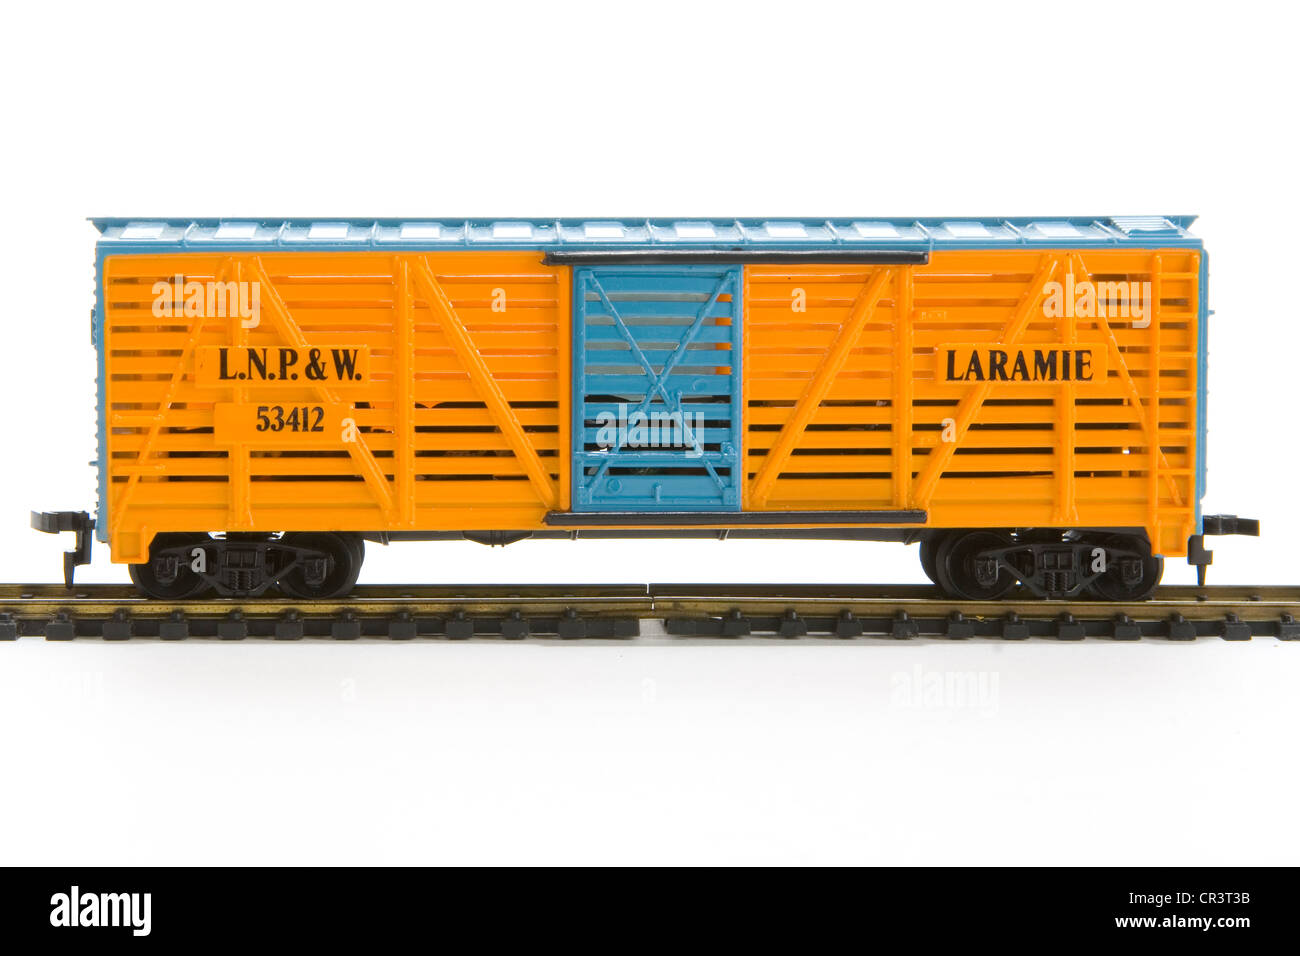 HO scale model train car - Stock Image